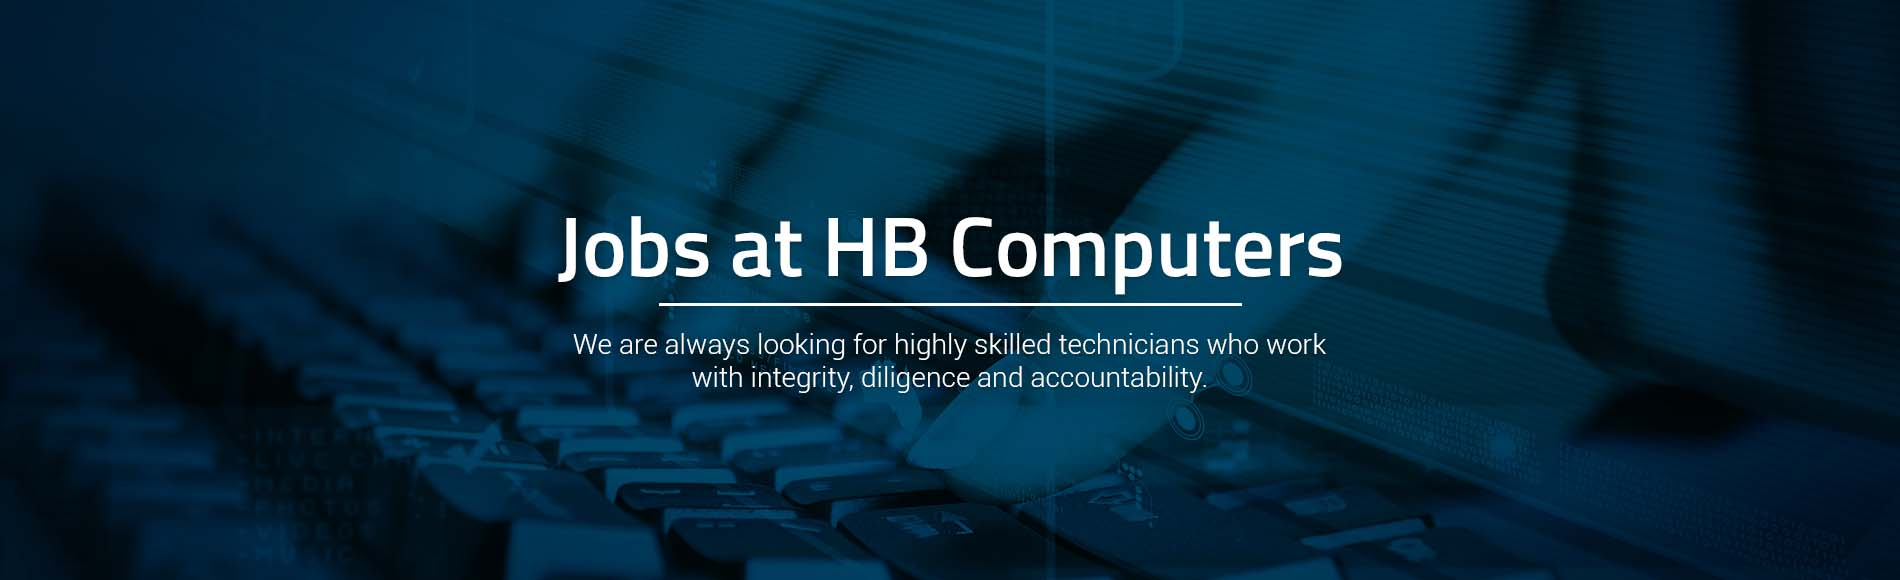 Jobs at HB Computers